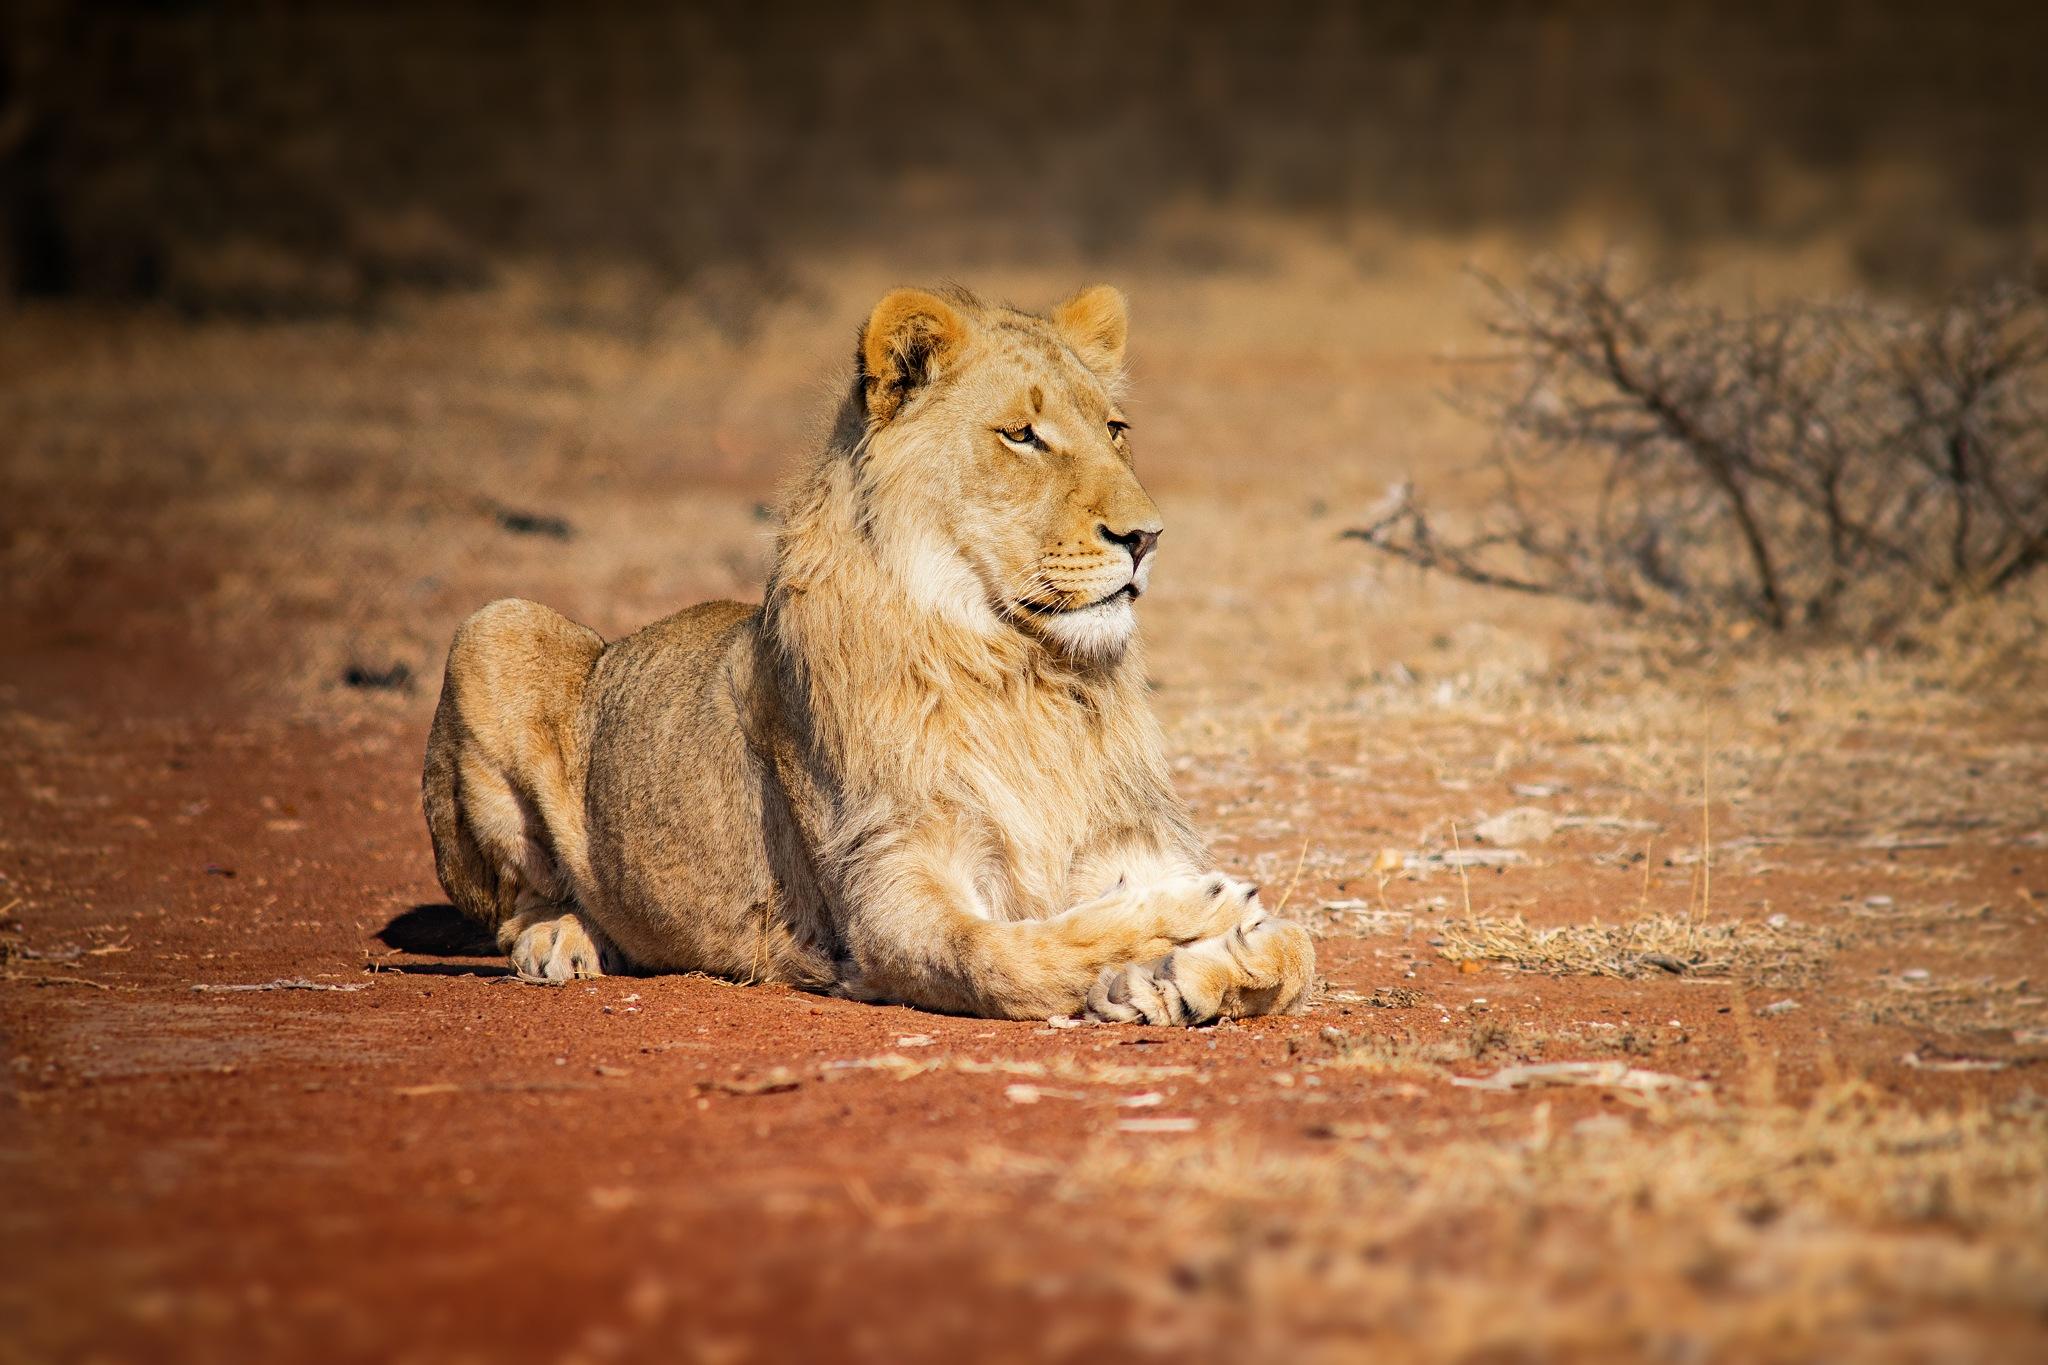 Lions of Polokwane by Bohemian Arrows